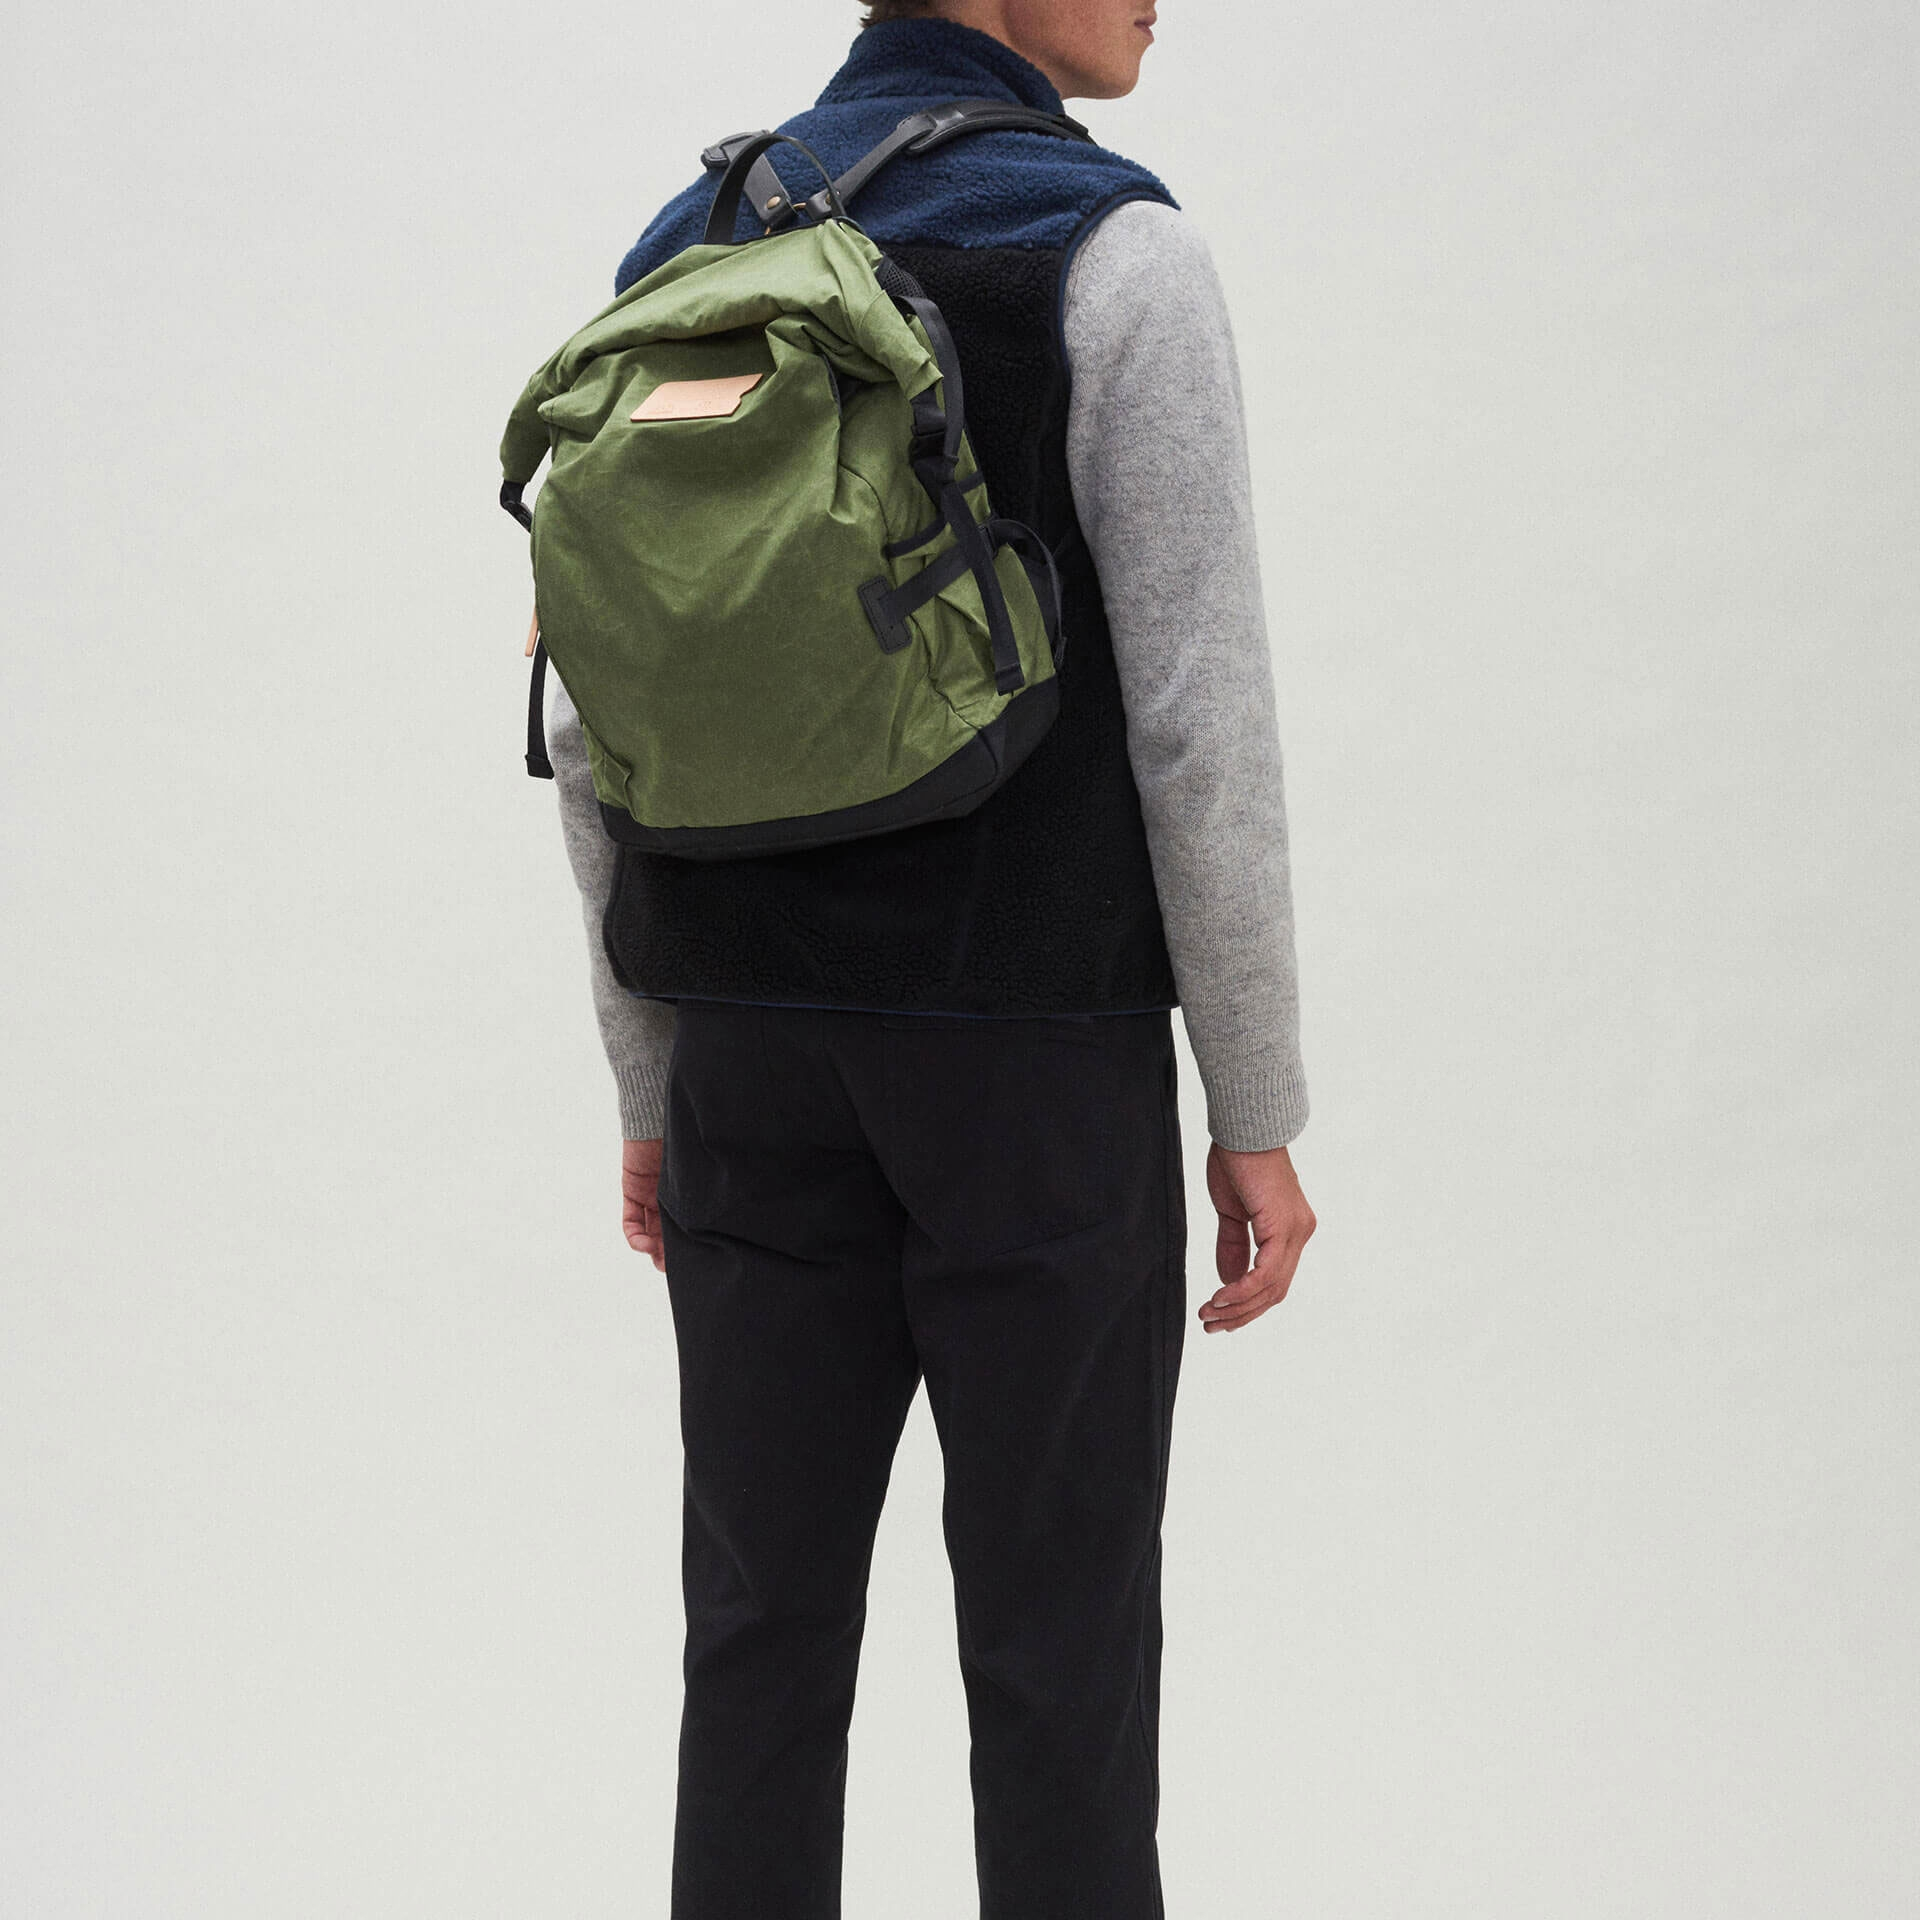 20L Basile Backpack - Bancha Green (image n°5)